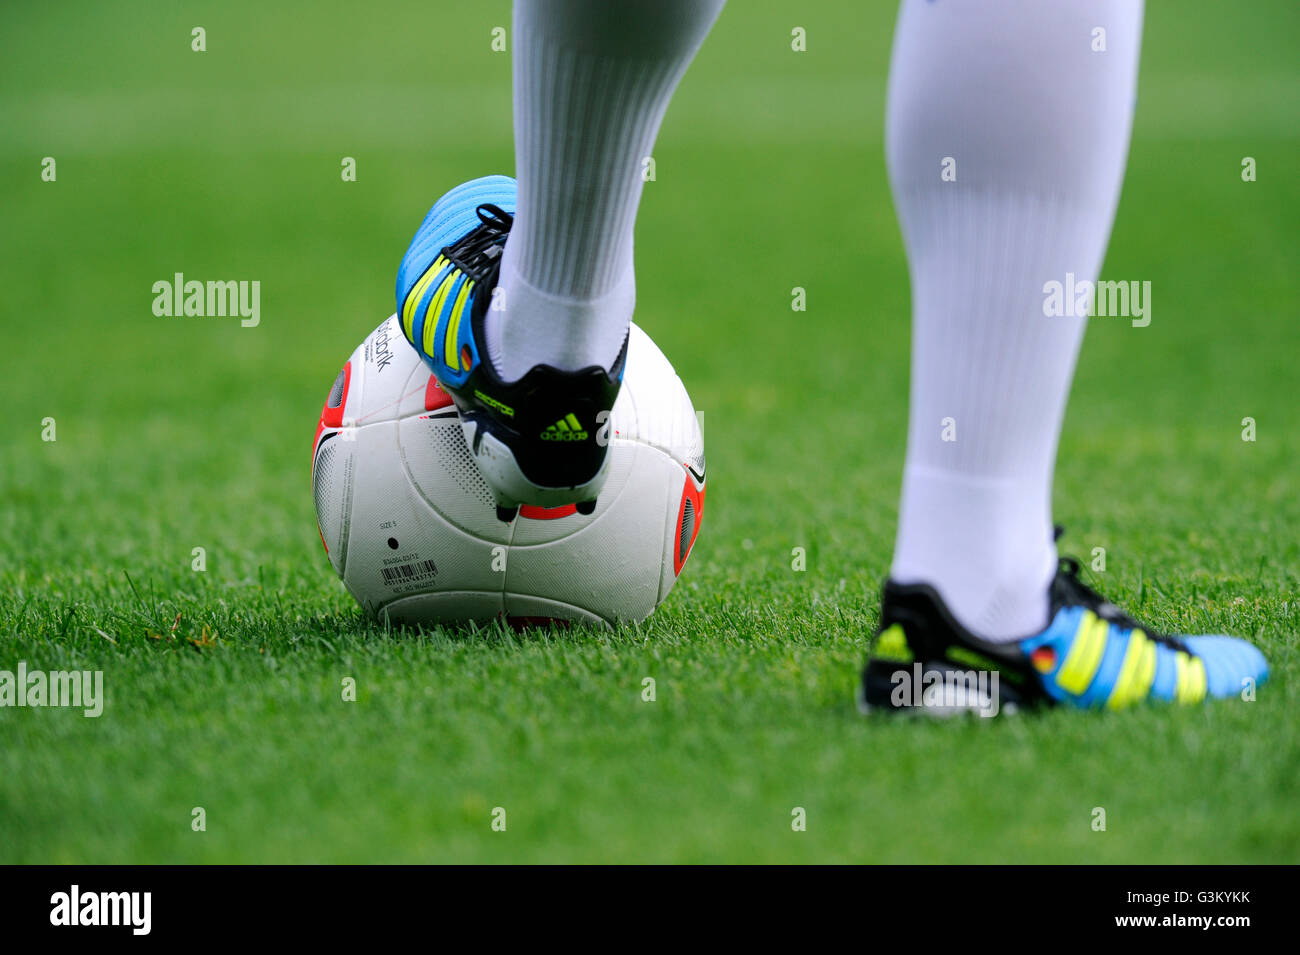 Details about Football Adidas Torfabrik Bundesliga 2014 2015 Top Training [Size 4] Germany show original title